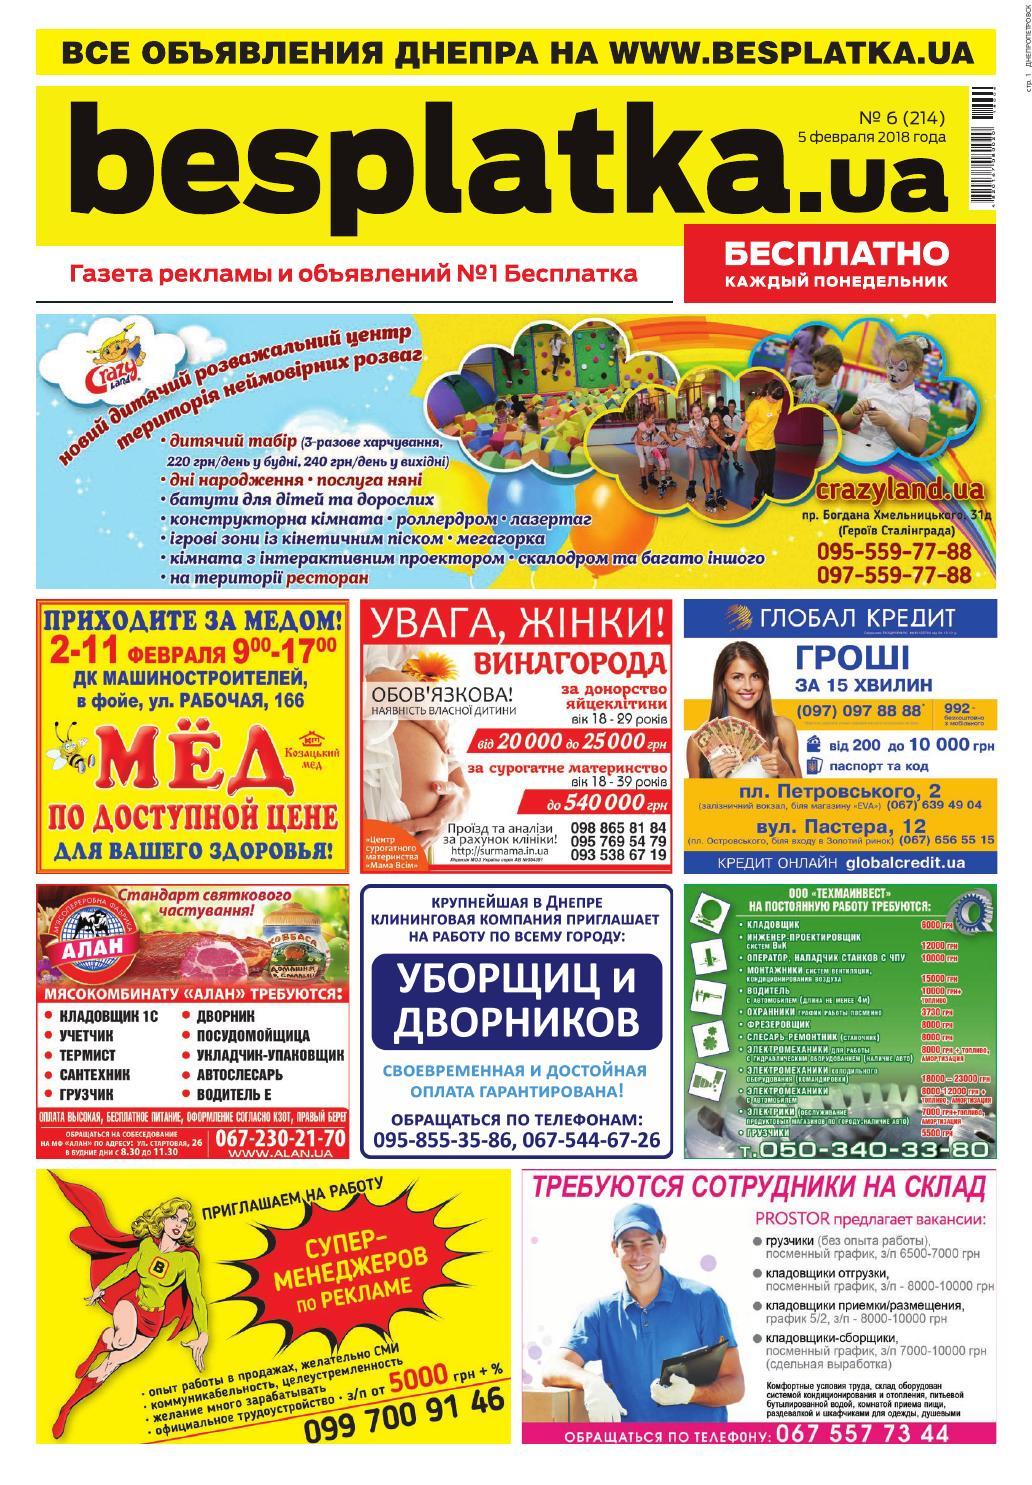 281de9e414c5 Besplatka #6 Днепр by besplatka ukraine - issuu